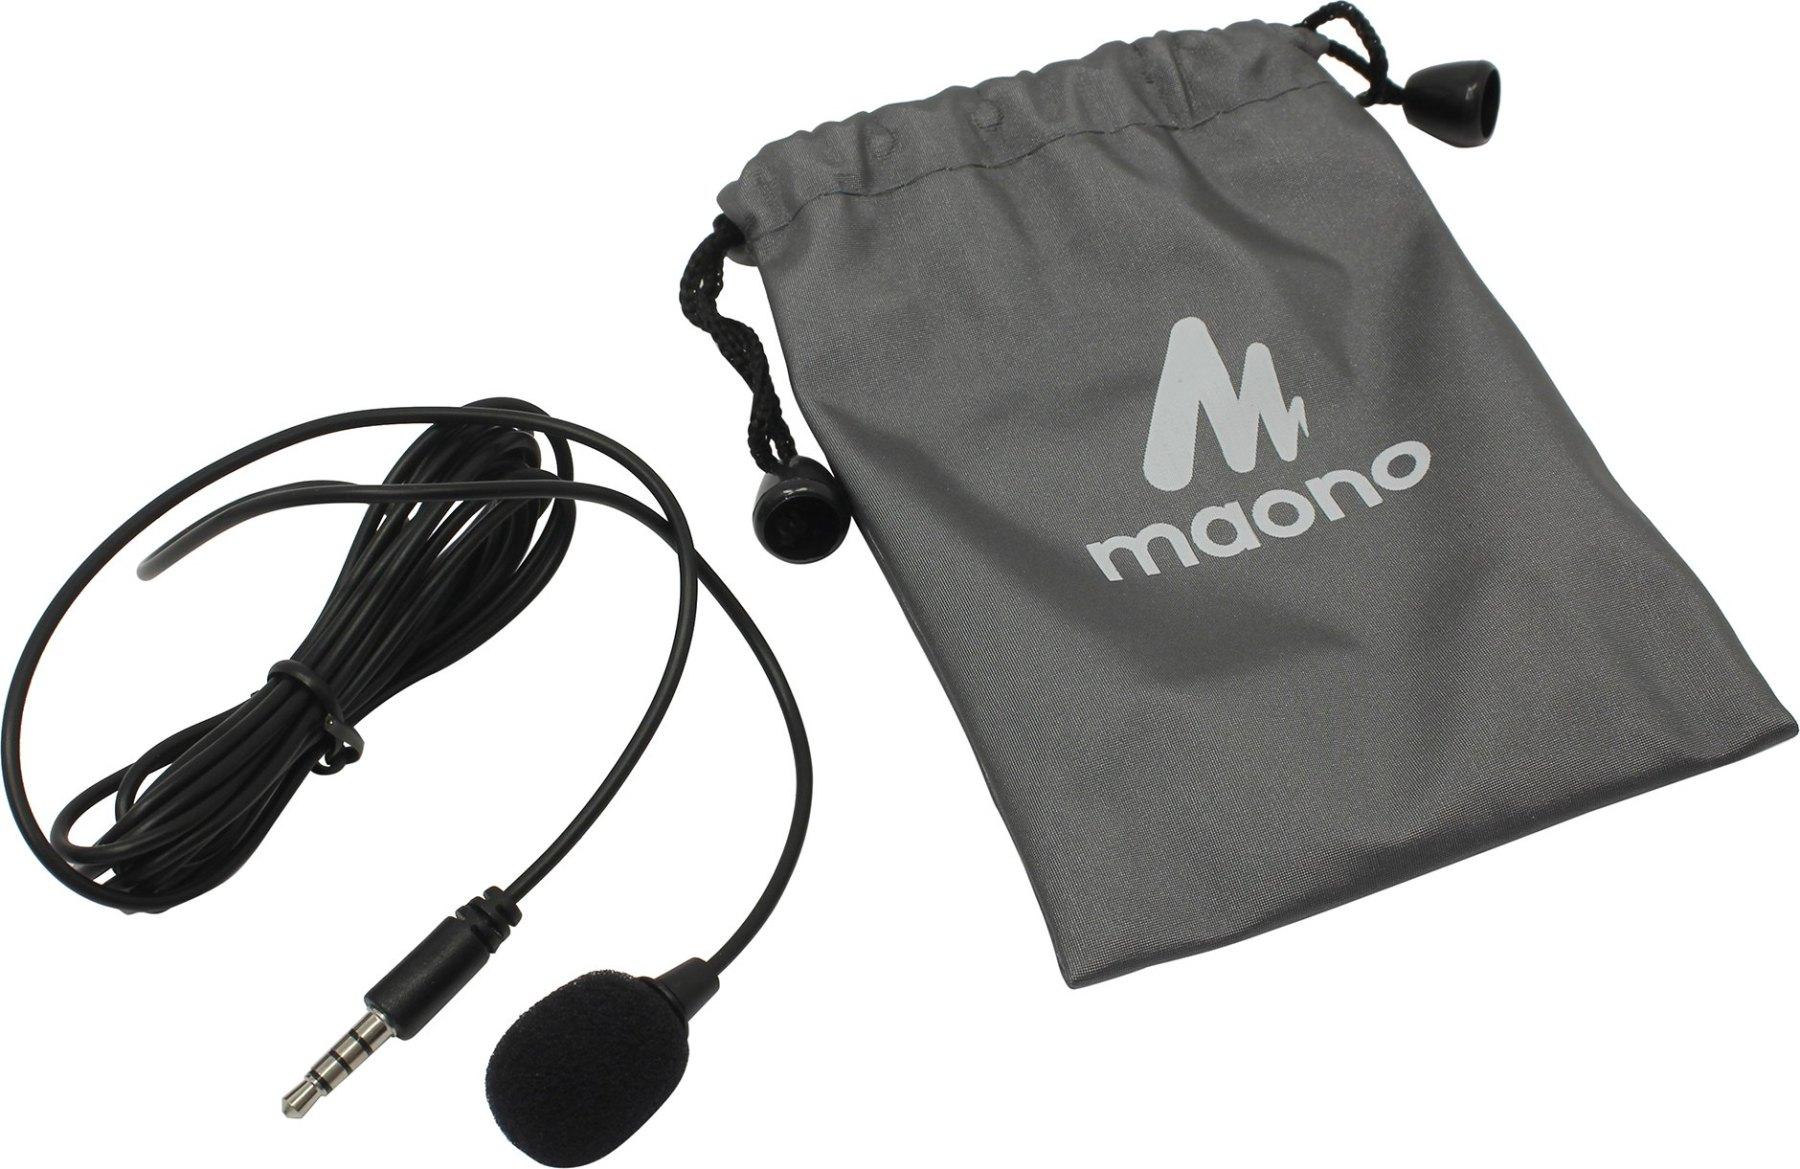 Lavalier microphone maono au 402l (black)|Microphones| - AliExpress